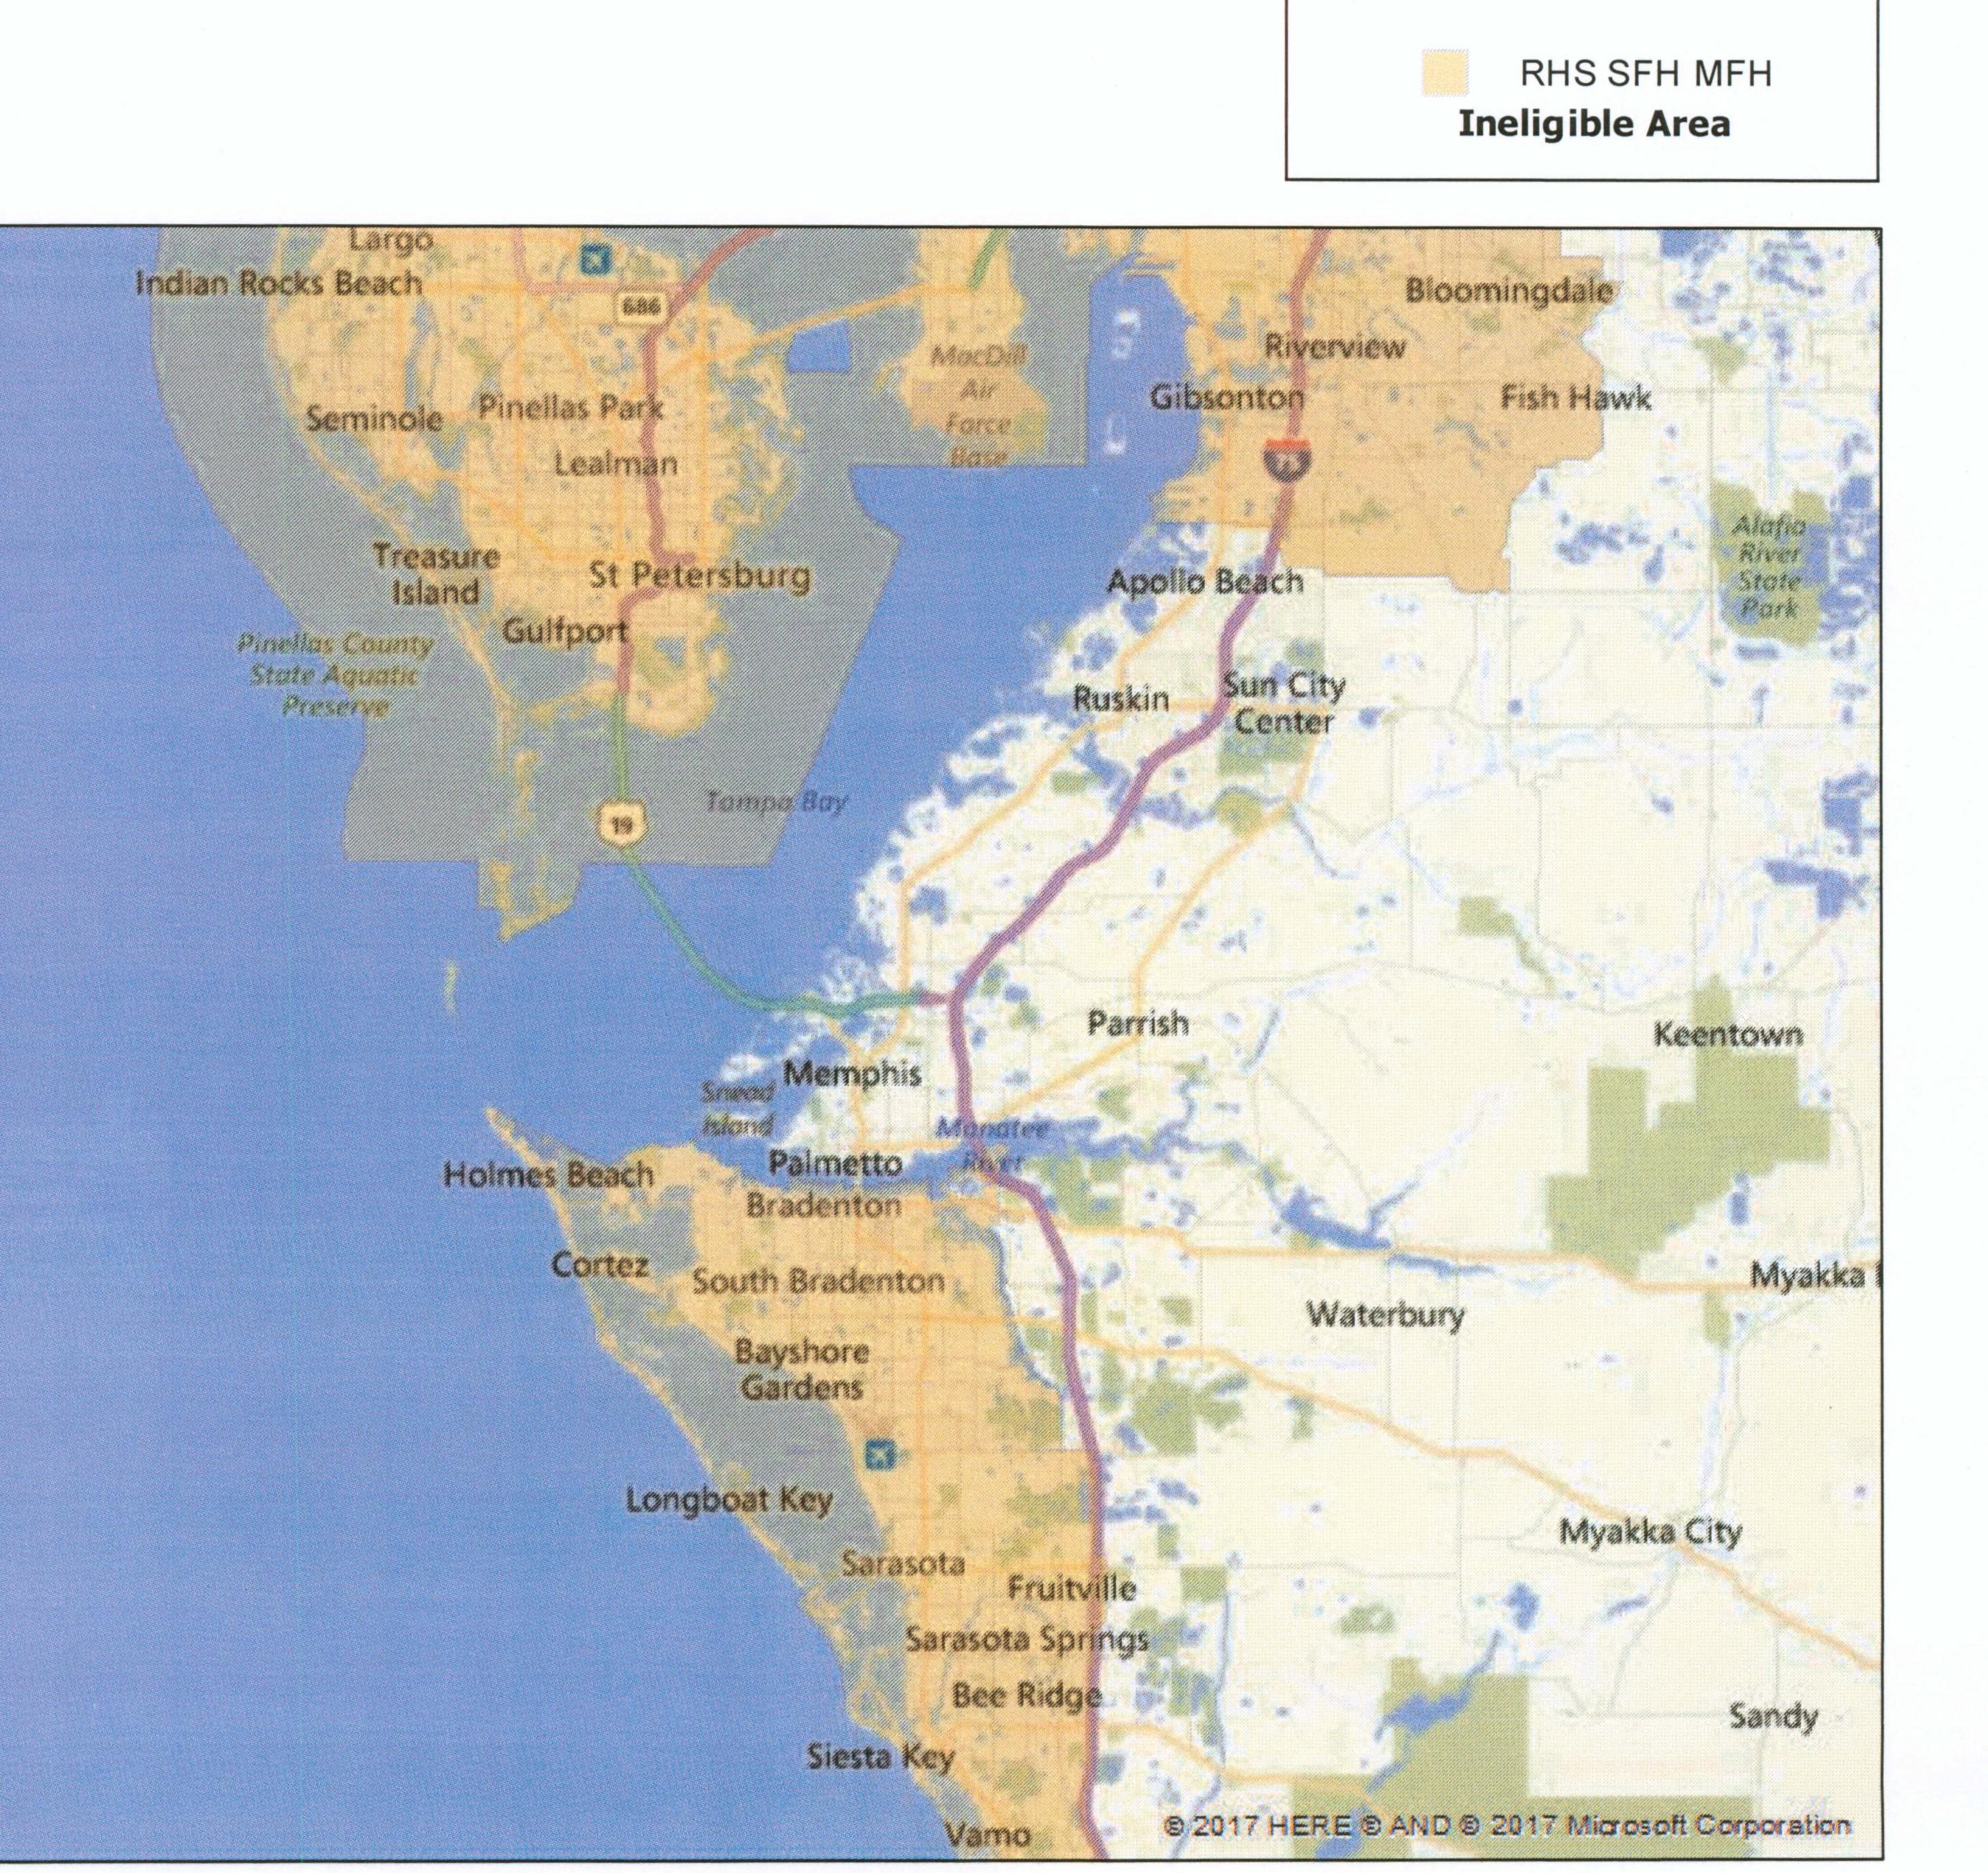 Usda Loan | Multiline Mortgage | (941) 201-9111 | Multiline Mortgage - Usda Loan Eligibility Map Florida